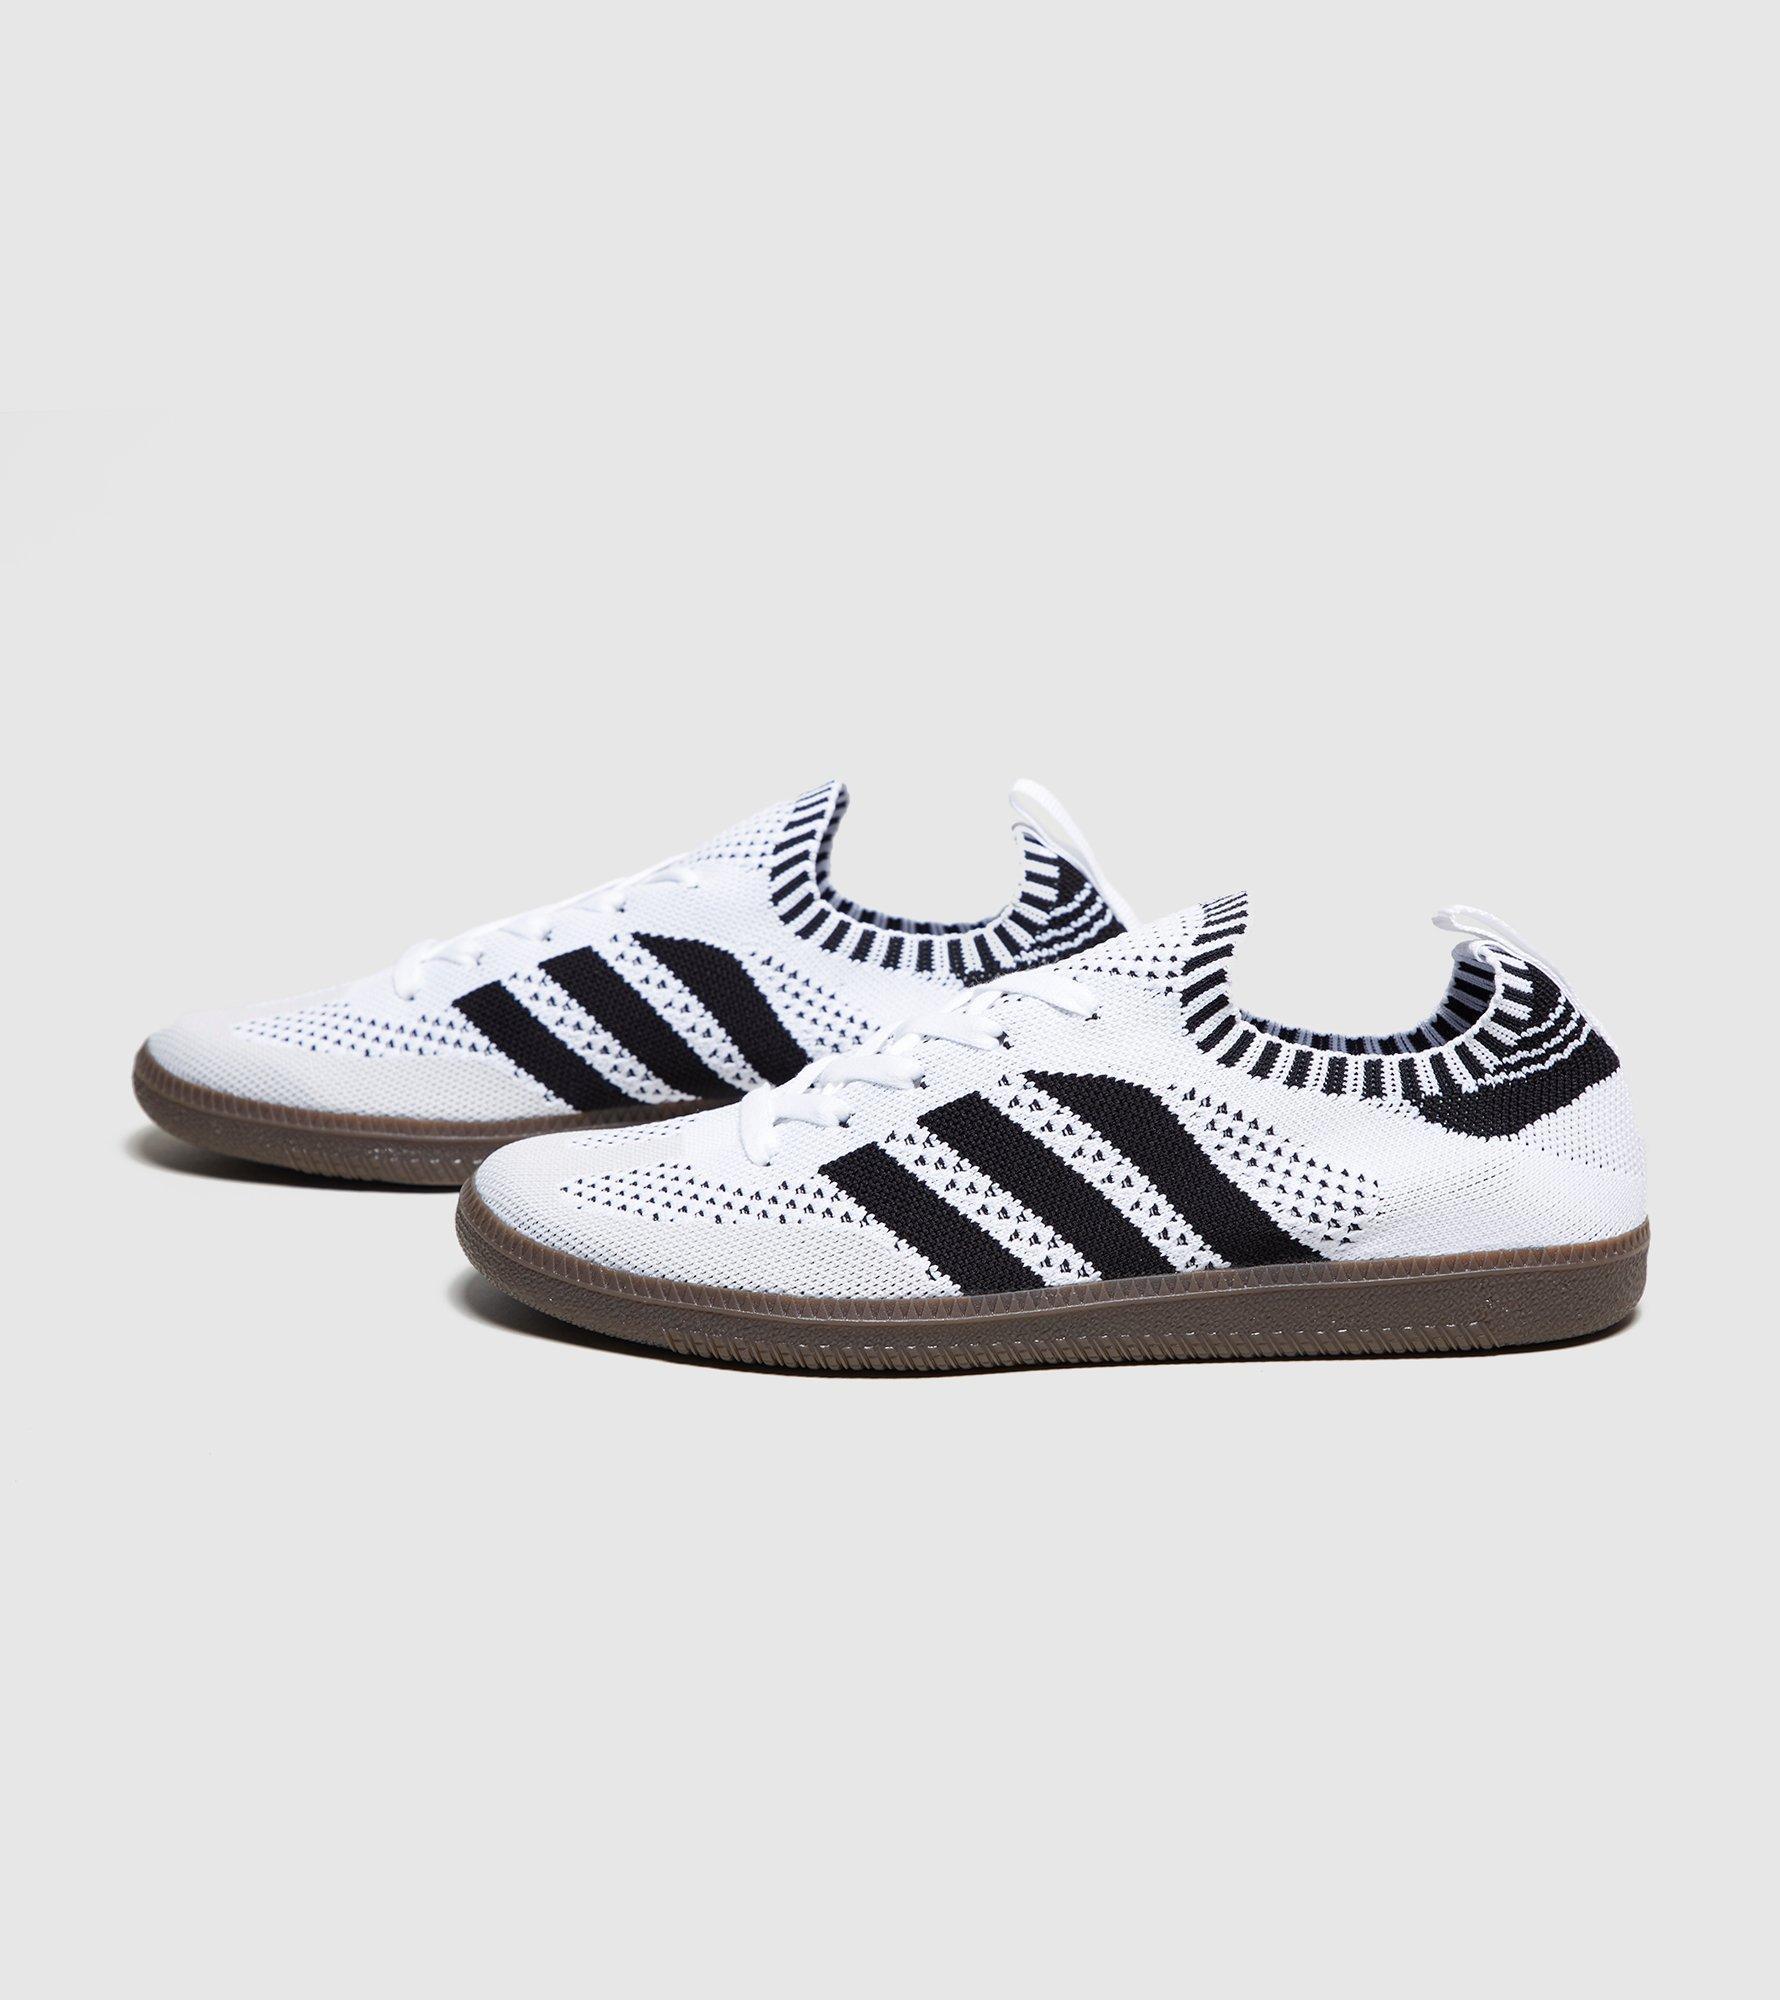 31c15bdef1ae australia adidas originals samba primeknit shoes black 9b907 eb3a2  italy  gallery. previously sold at size mens adidas samba a6e31 ecdc6